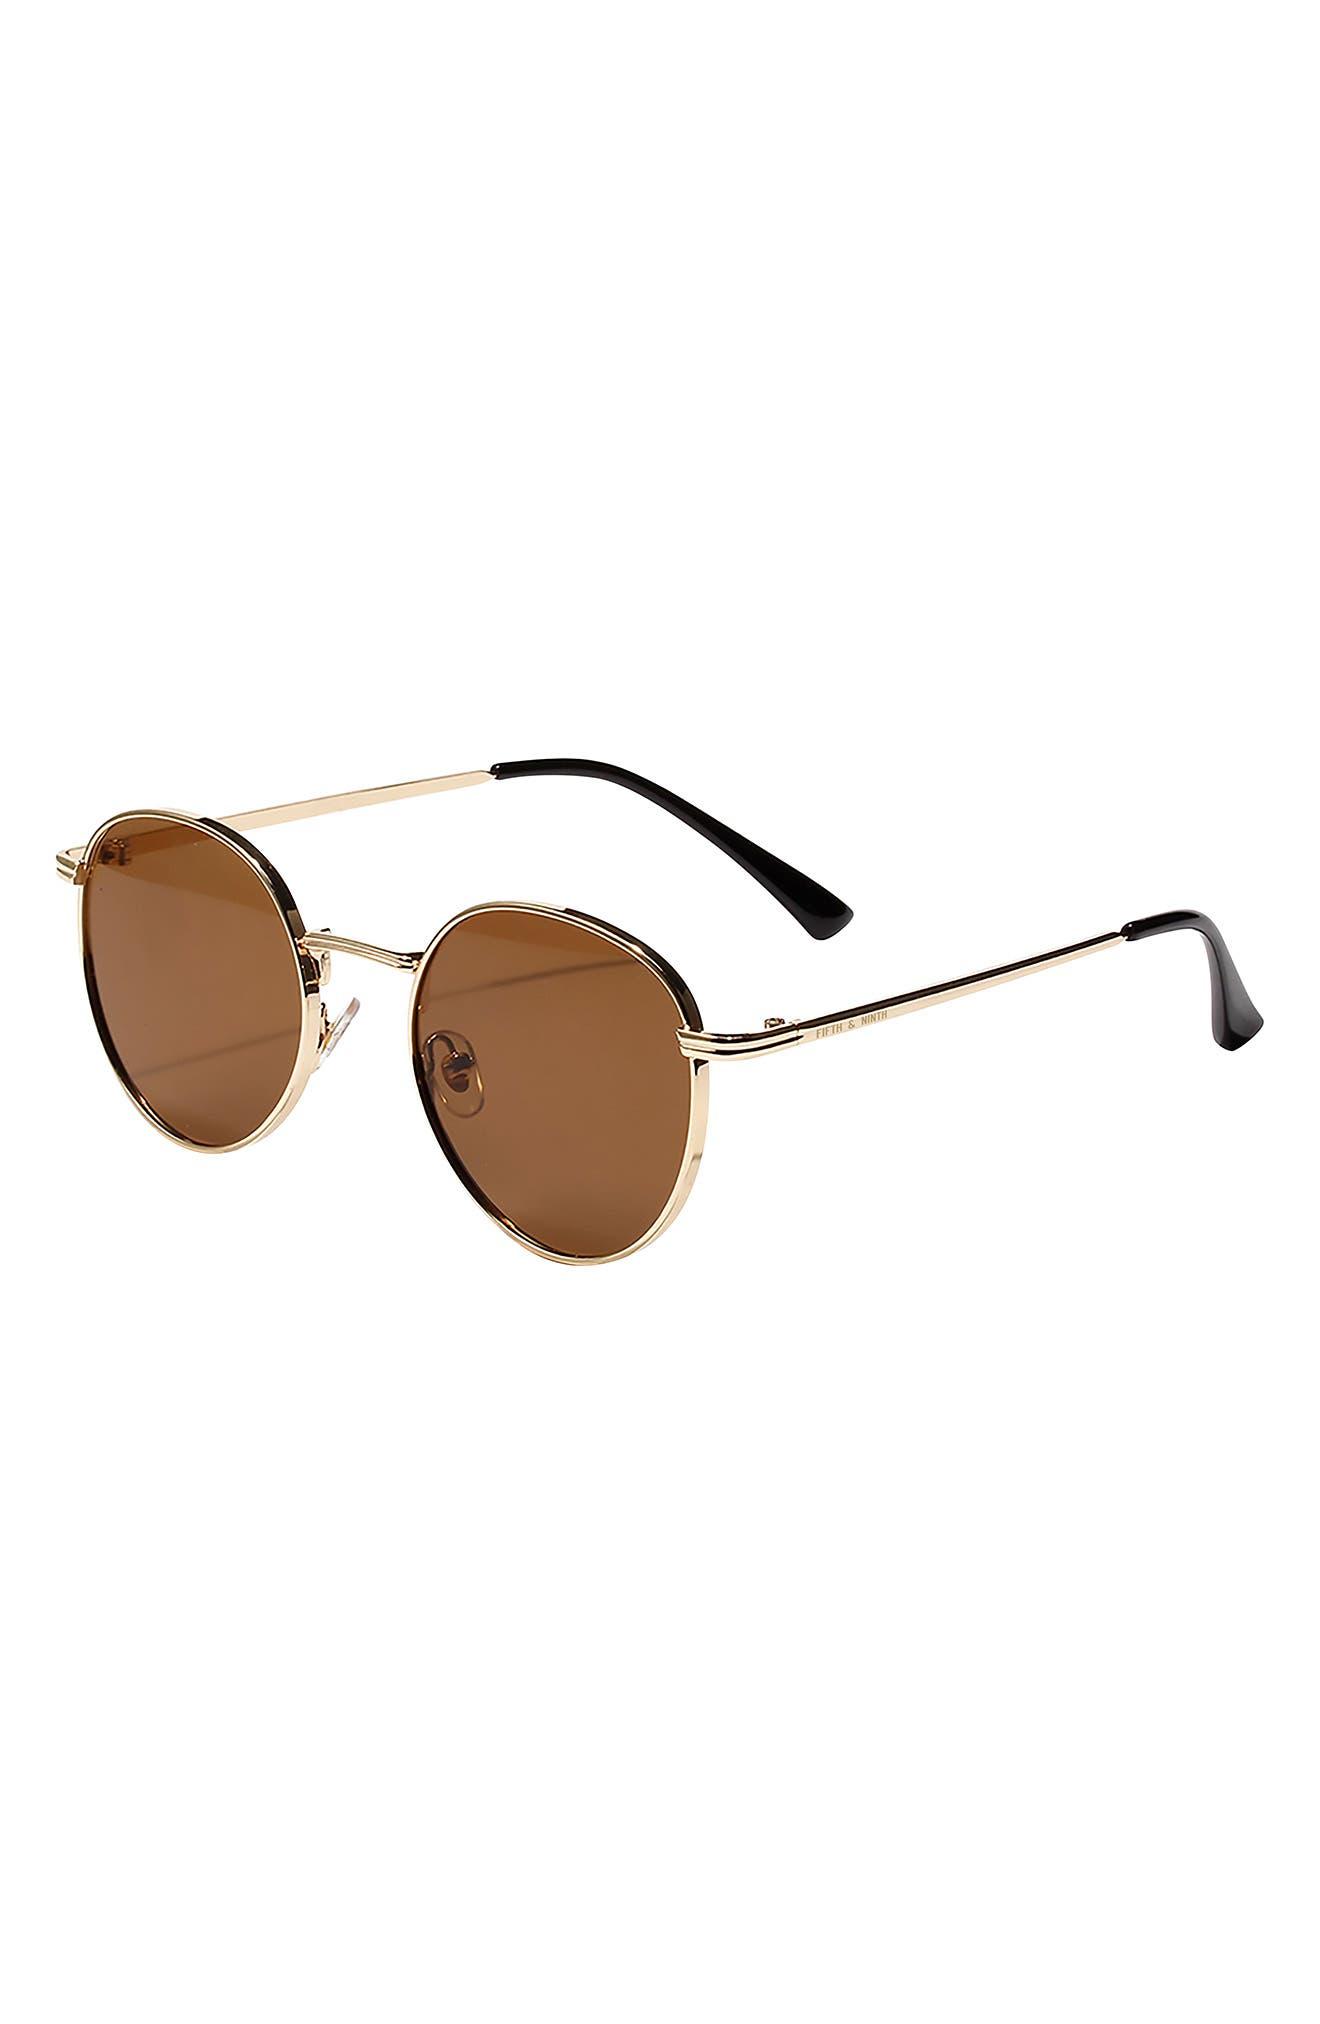 Jackson 50mm Round Sunglasses